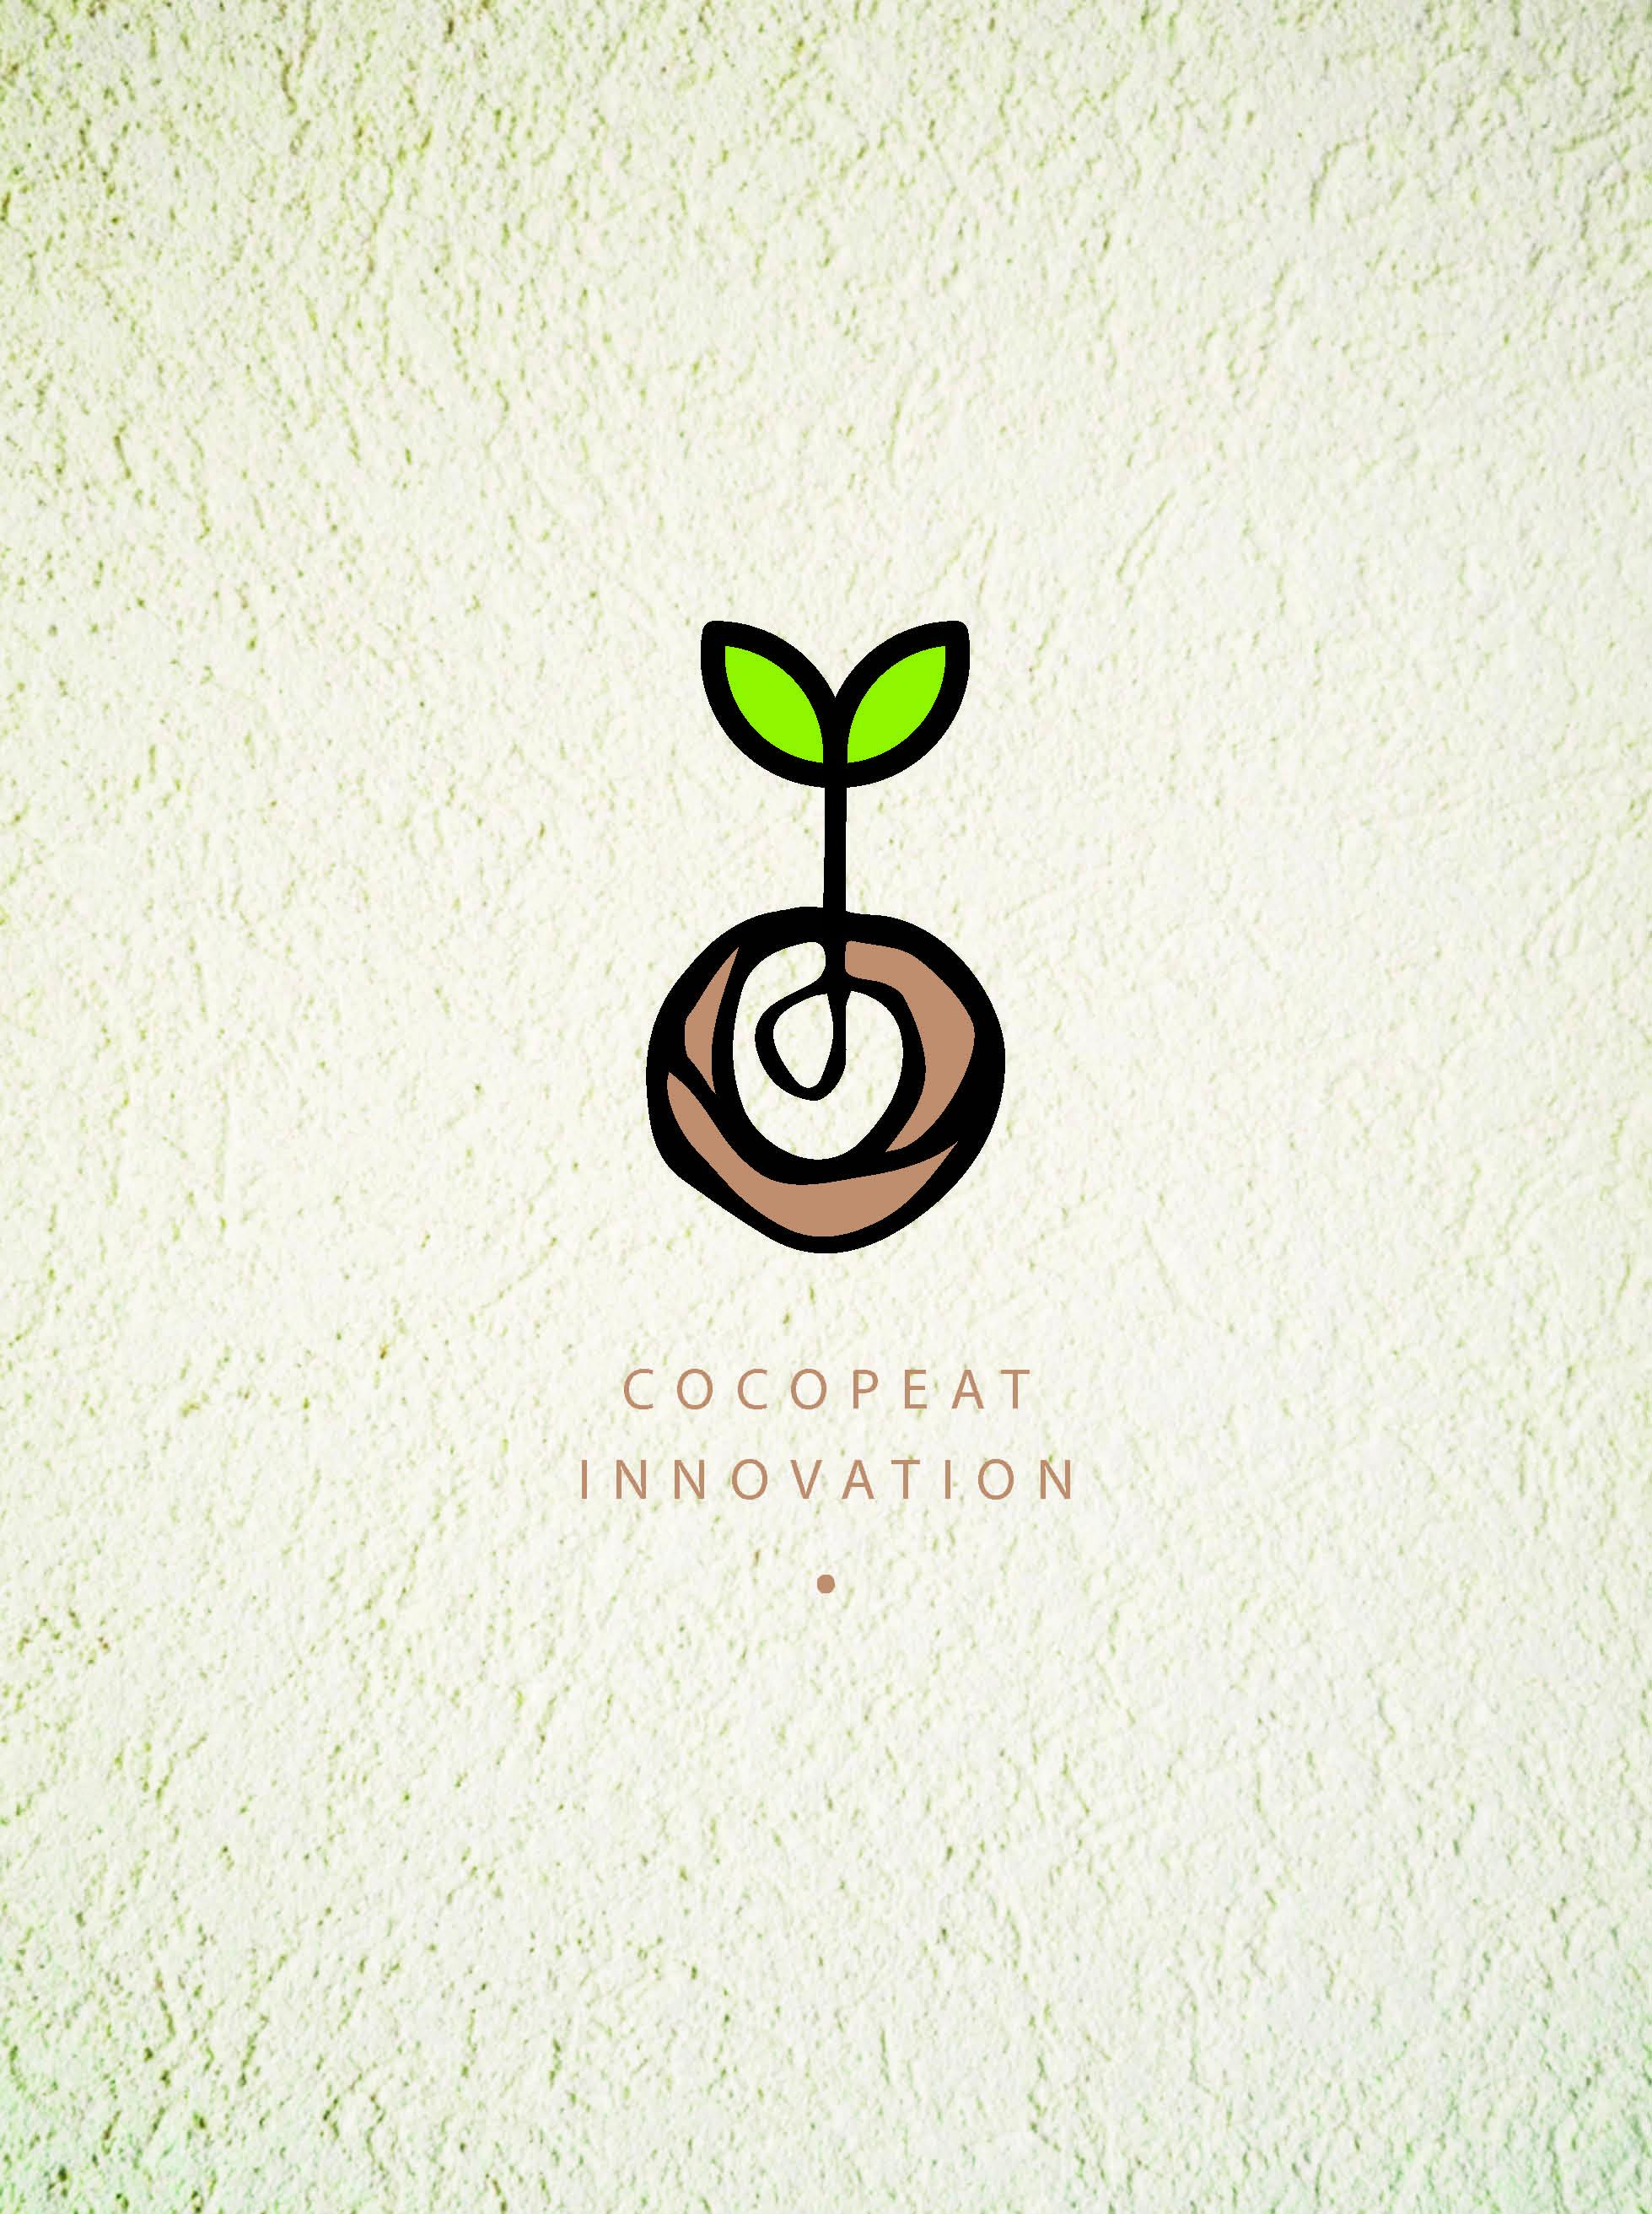 cocopeat innovation